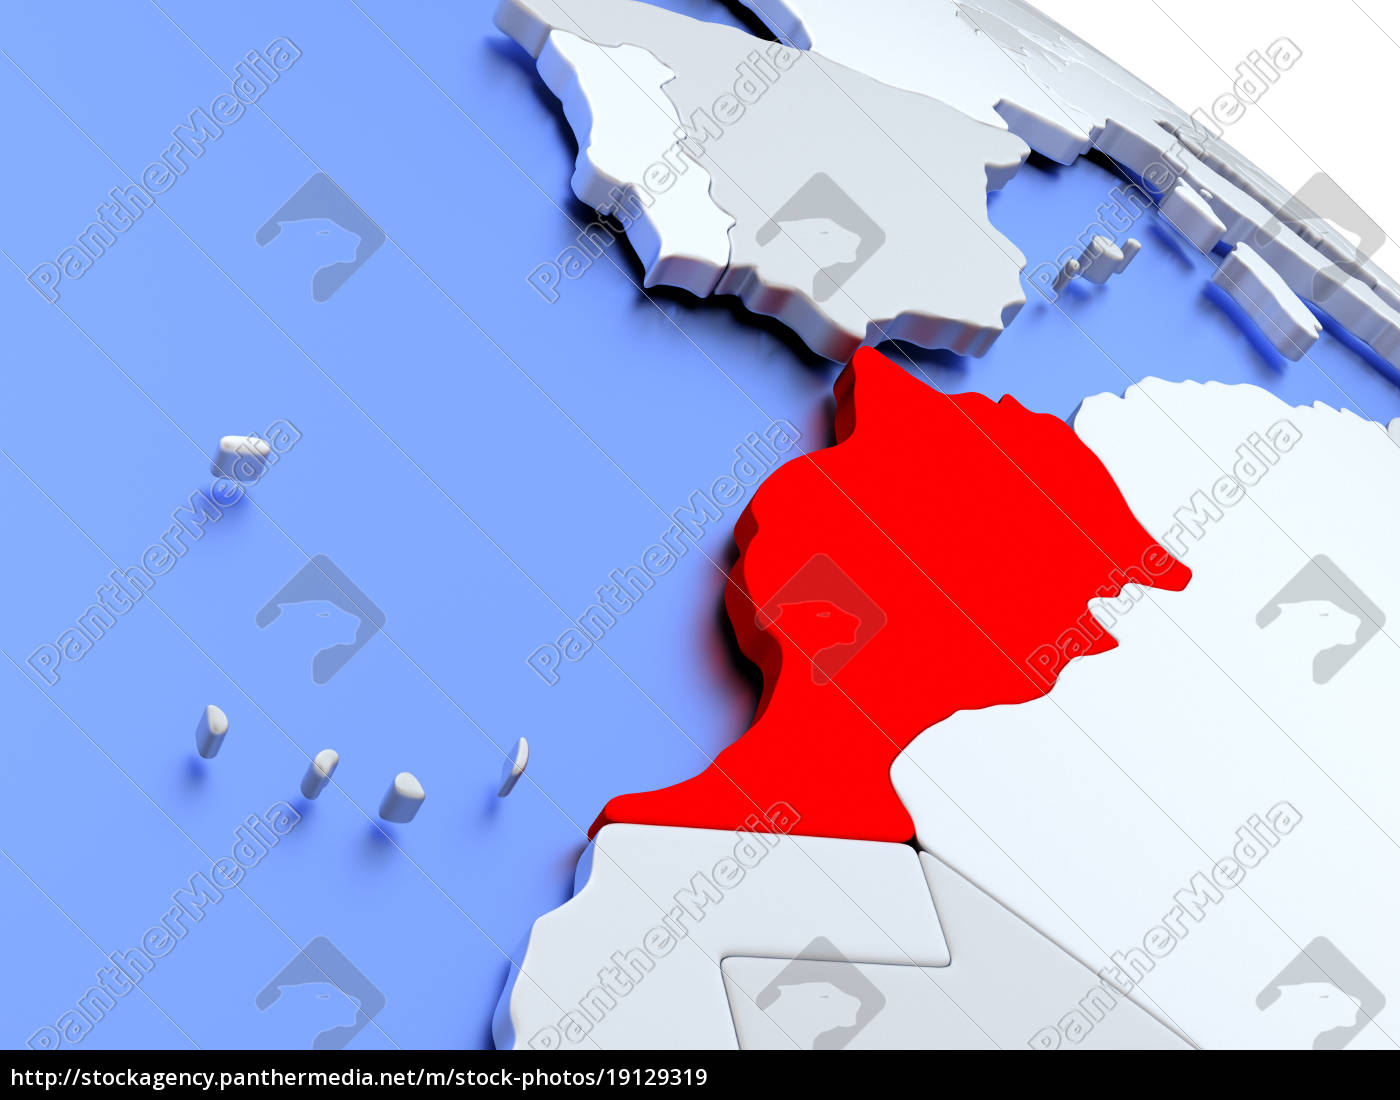 marrocos, no, mapa, do, mundo - 19129319